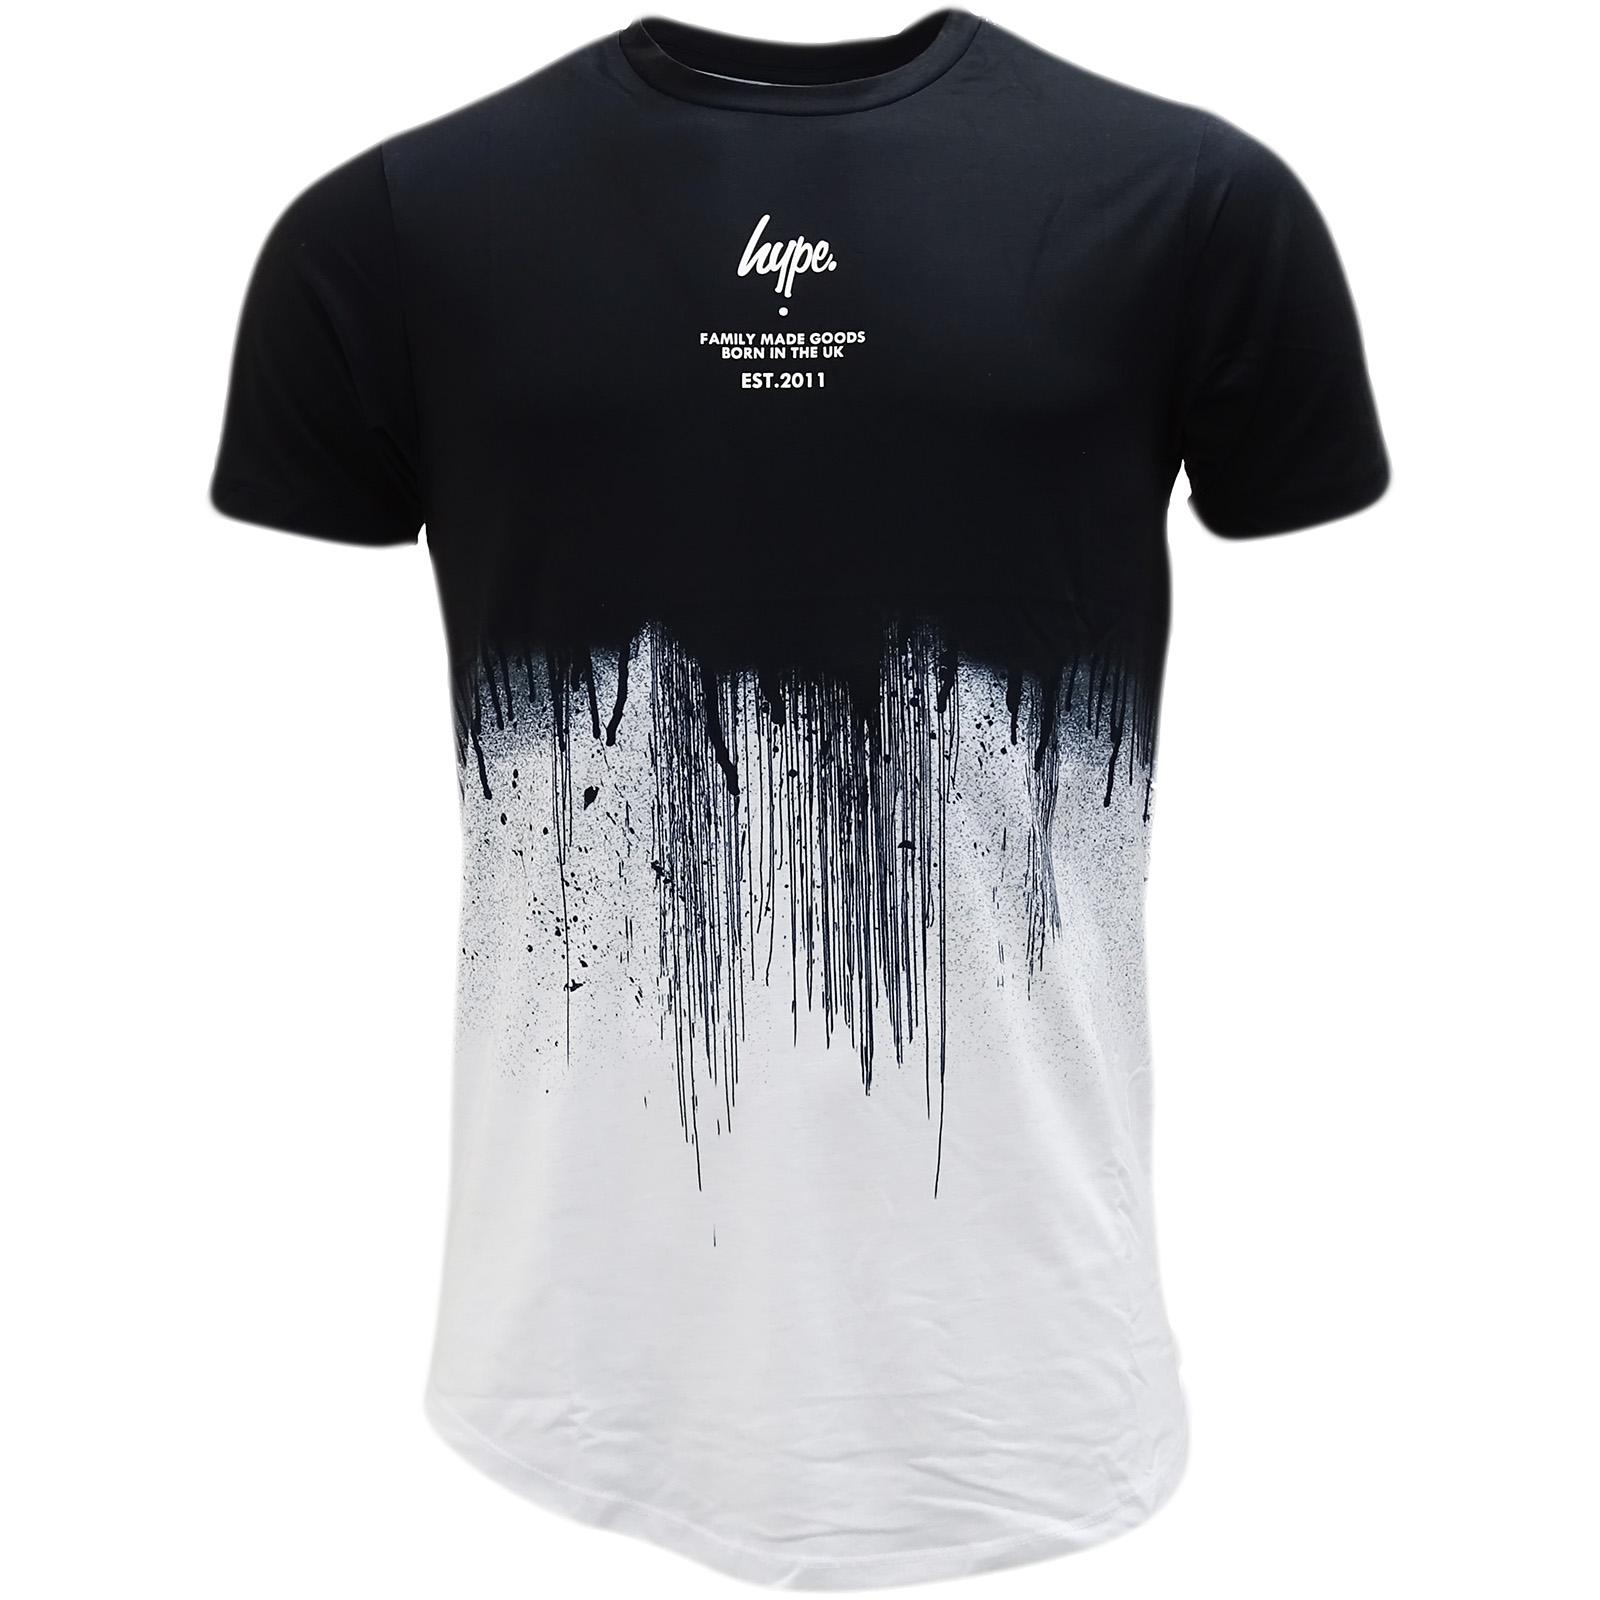 590fb4bdcd3 Sentinel Hype Black   White Curved Hem T-Shirt - Half Drips